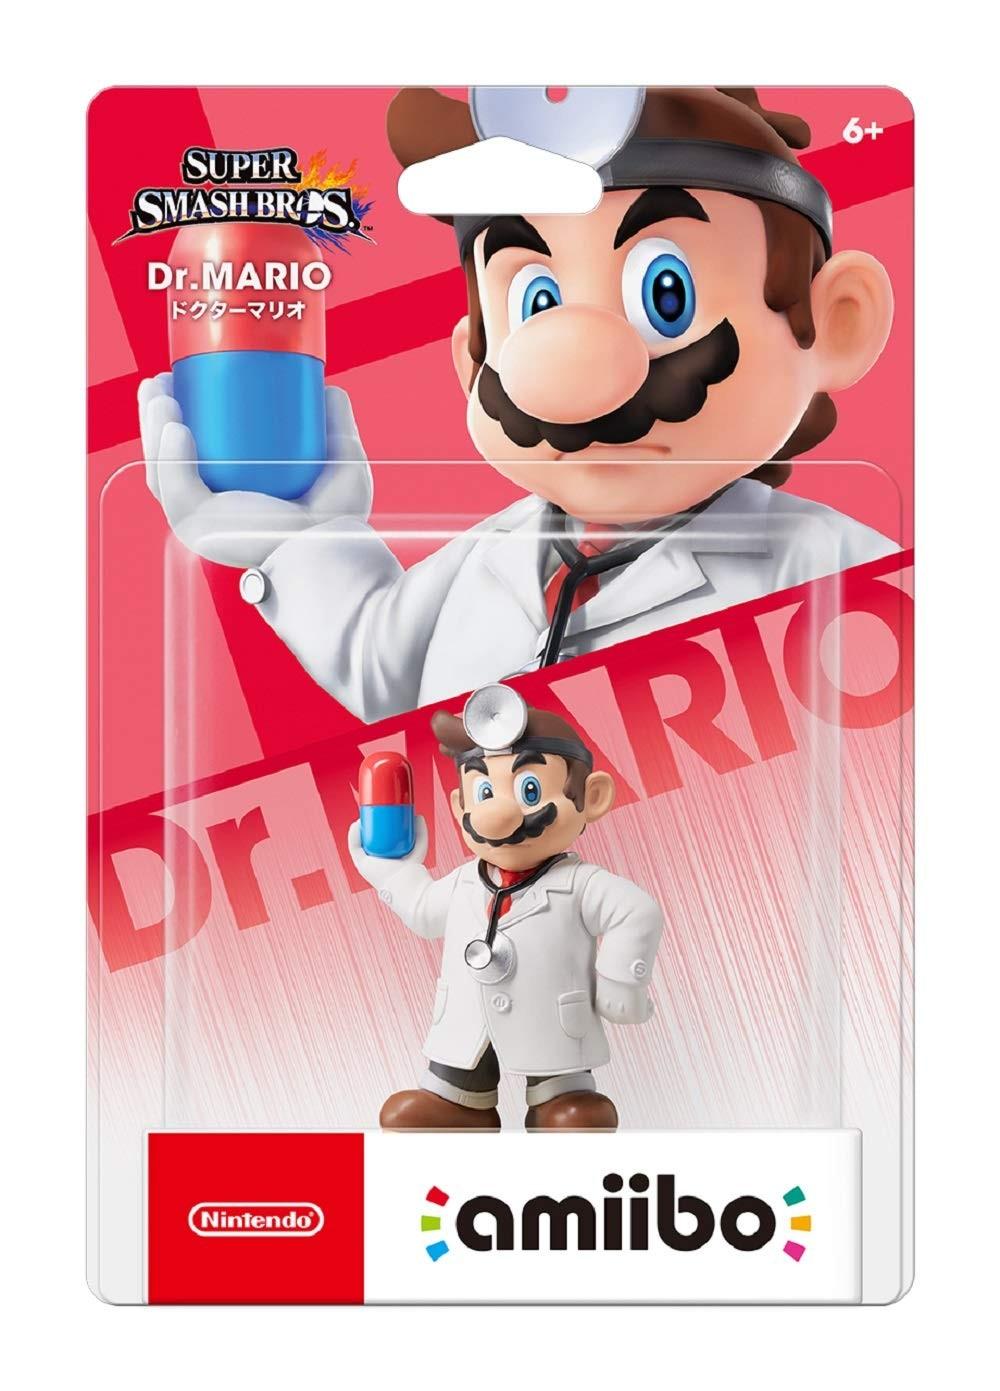 Super Smash Bros.: Интерактивная фигурка amiibo - Dr. Mario